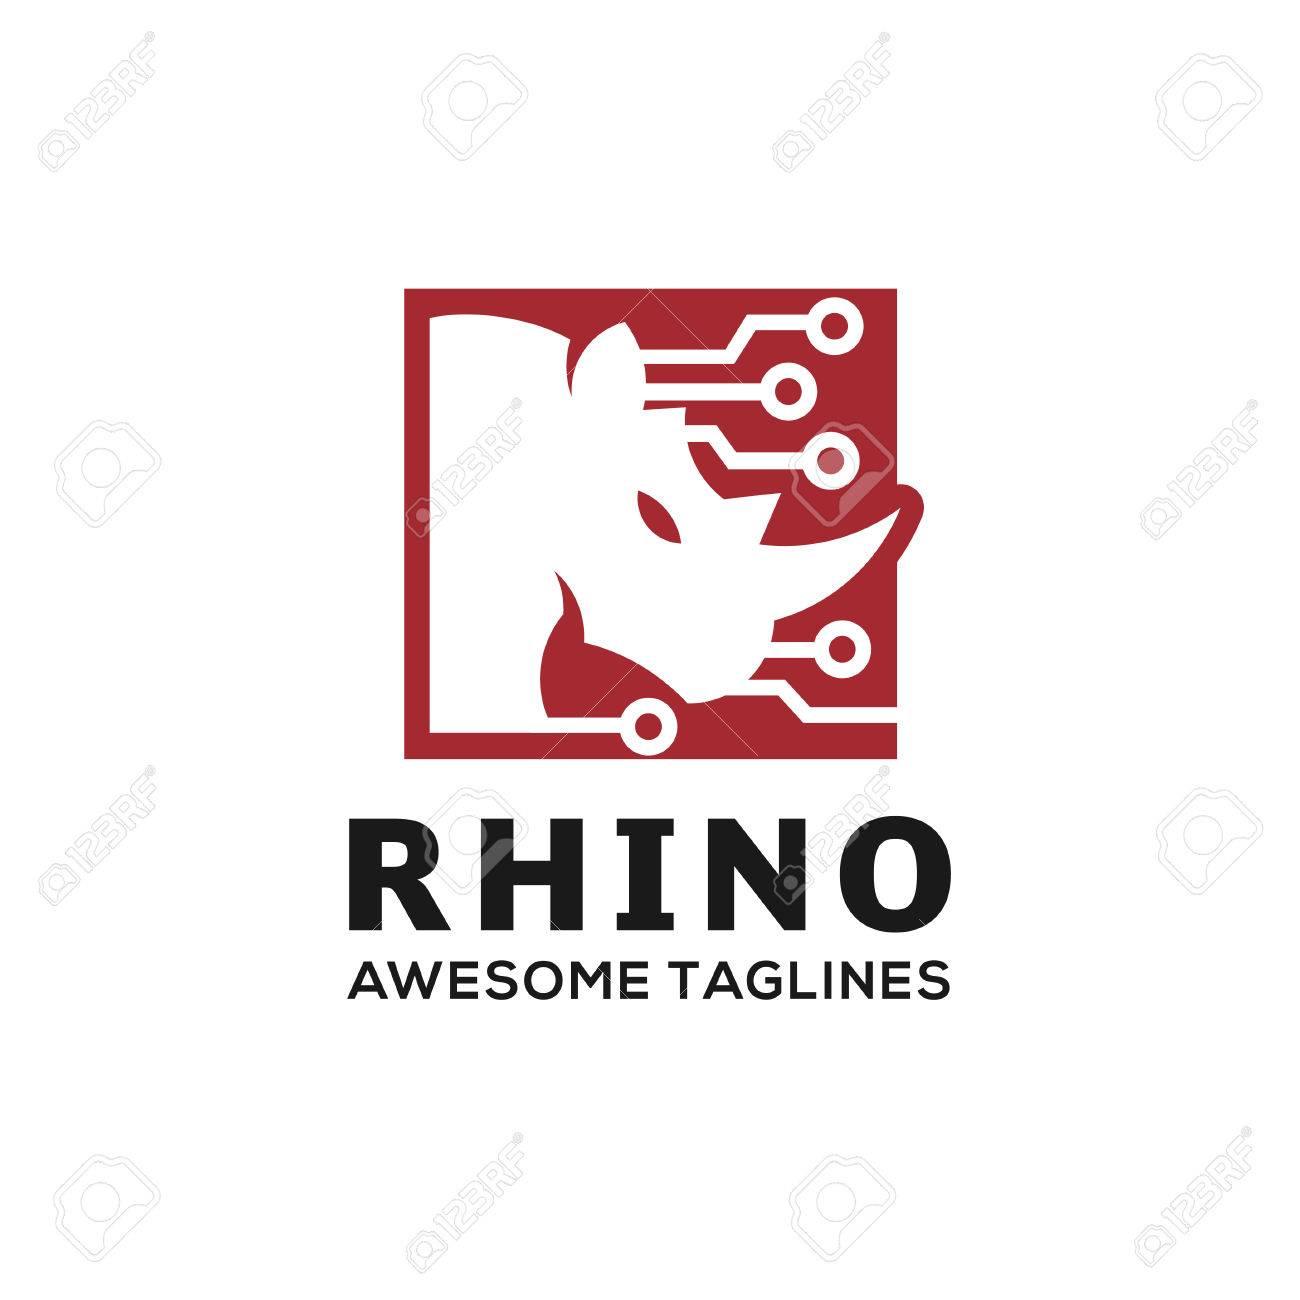 rhinoceros rhino logo rhino techno logo business template